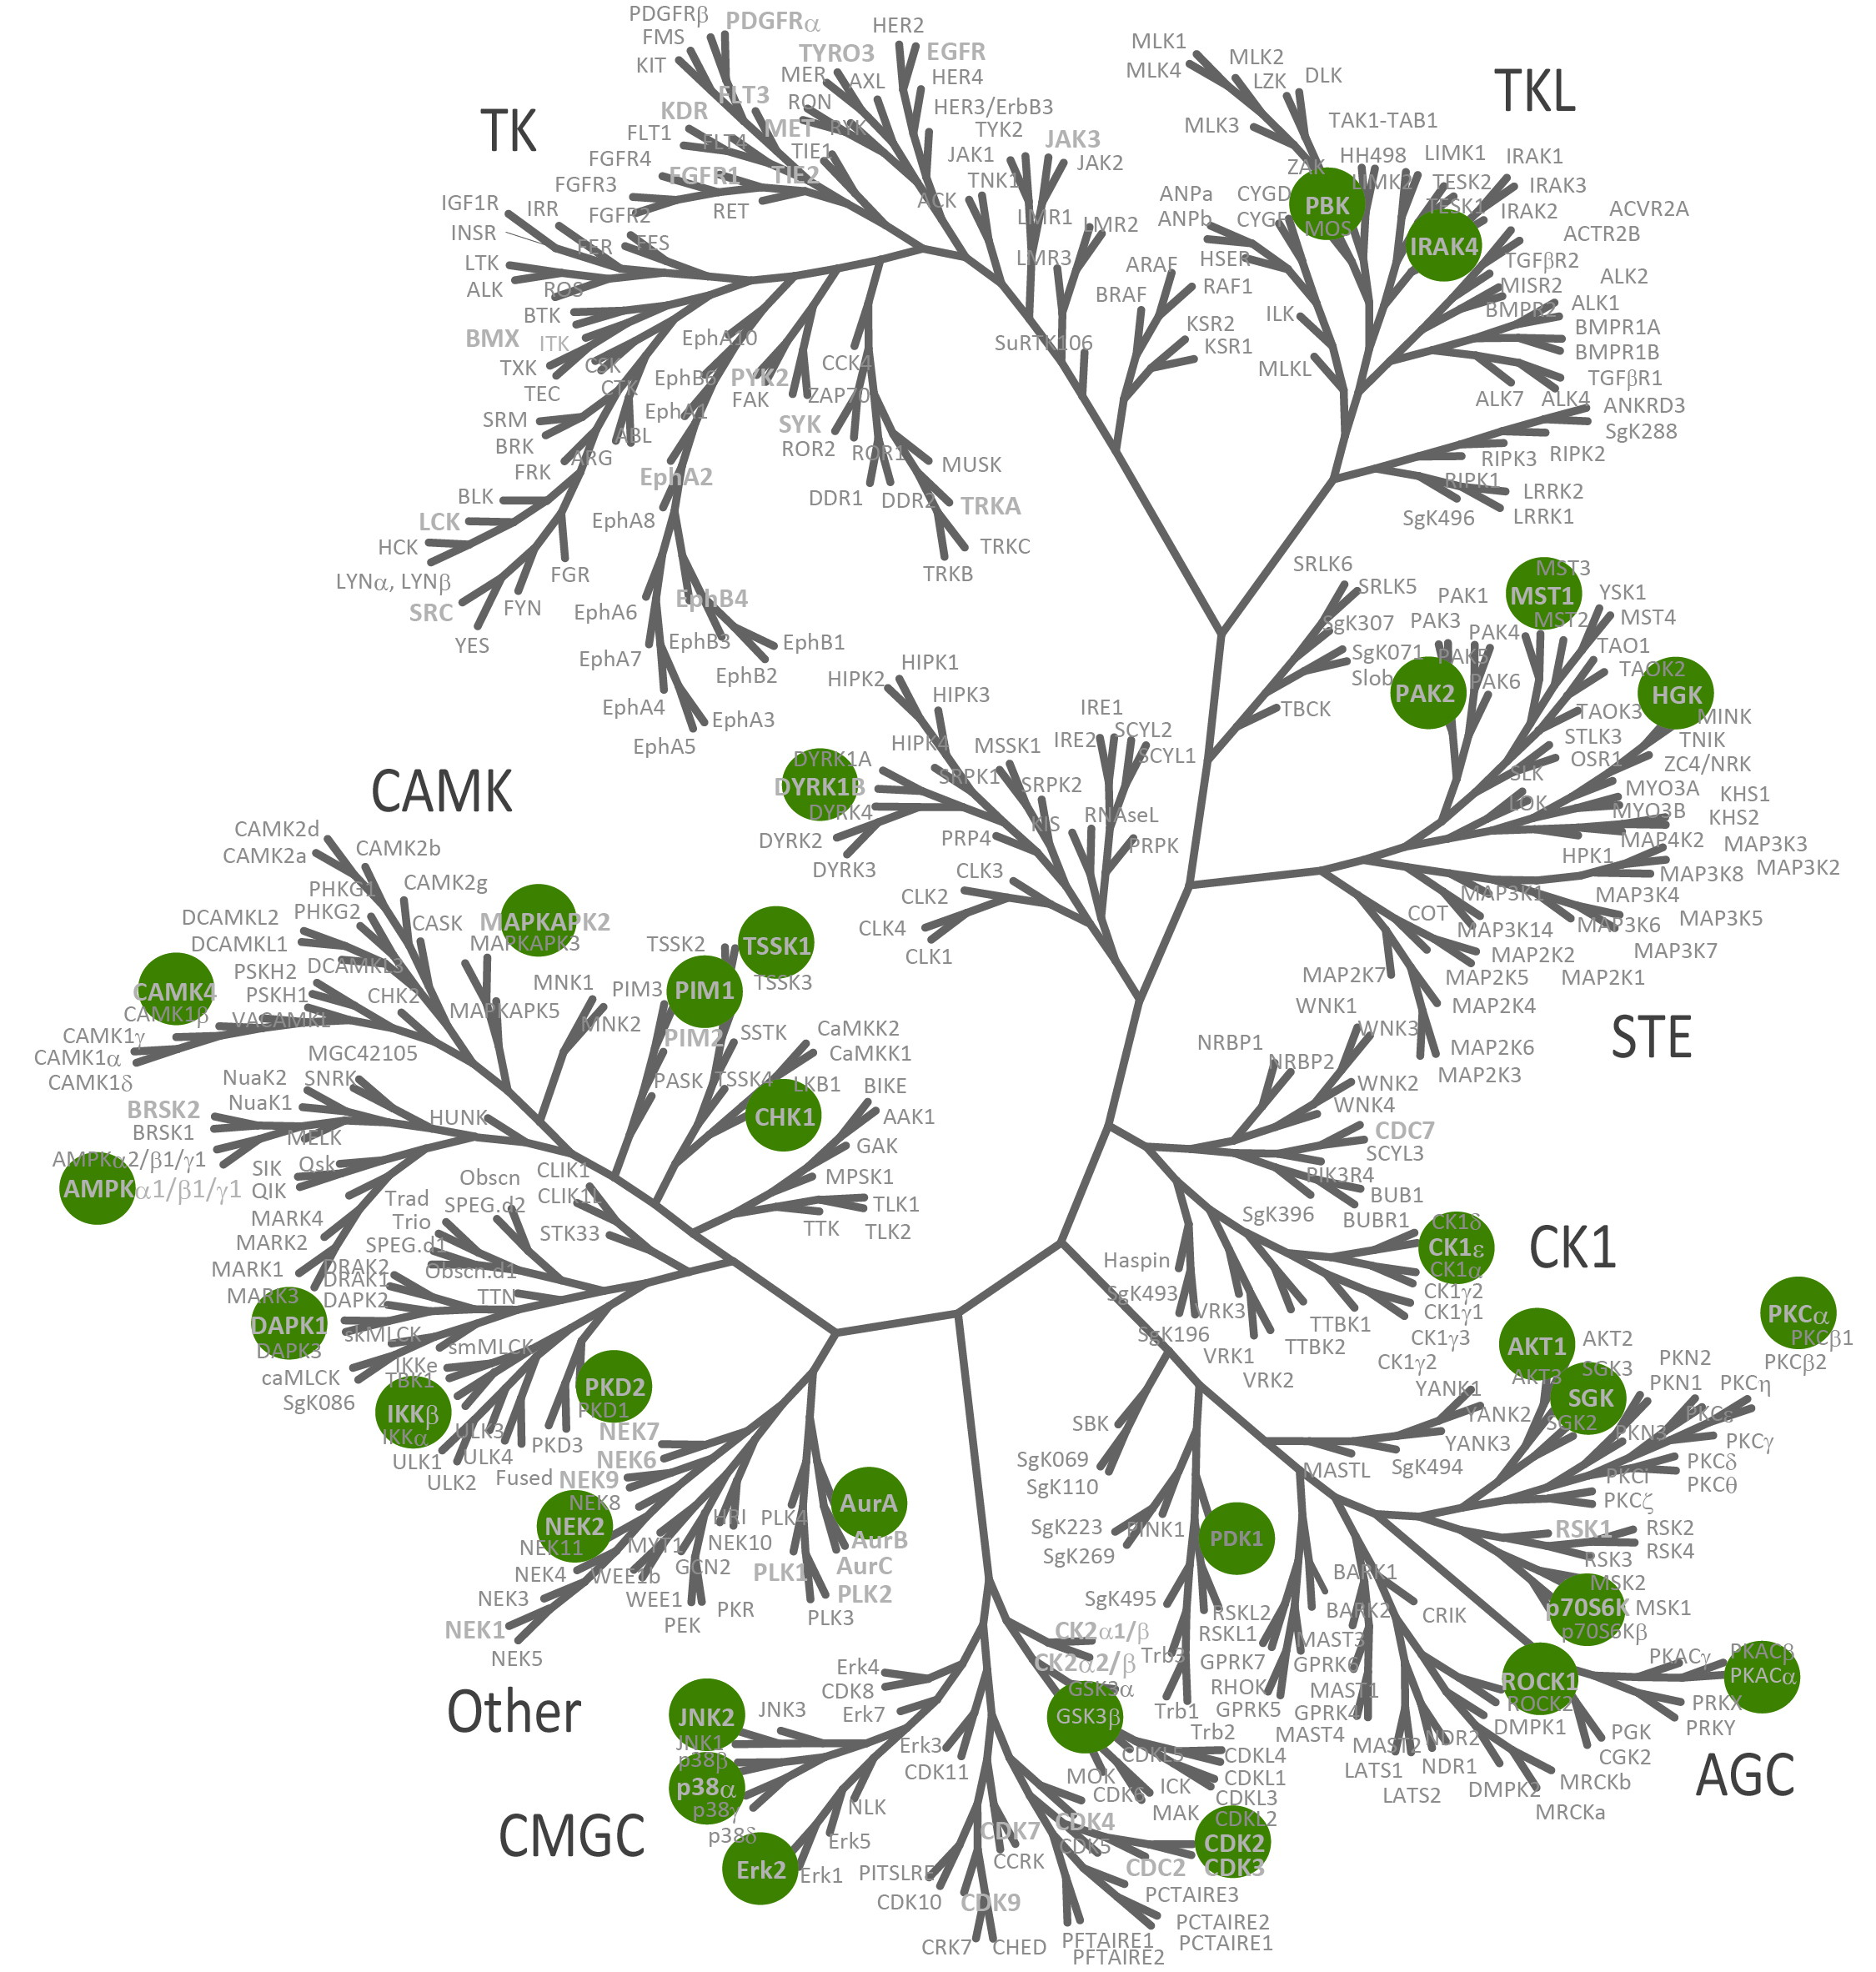 https://www.ntrc.nl/wp-content/uploads/2014/02/Kinome-Tree-Quickscout_STK_2.jpg